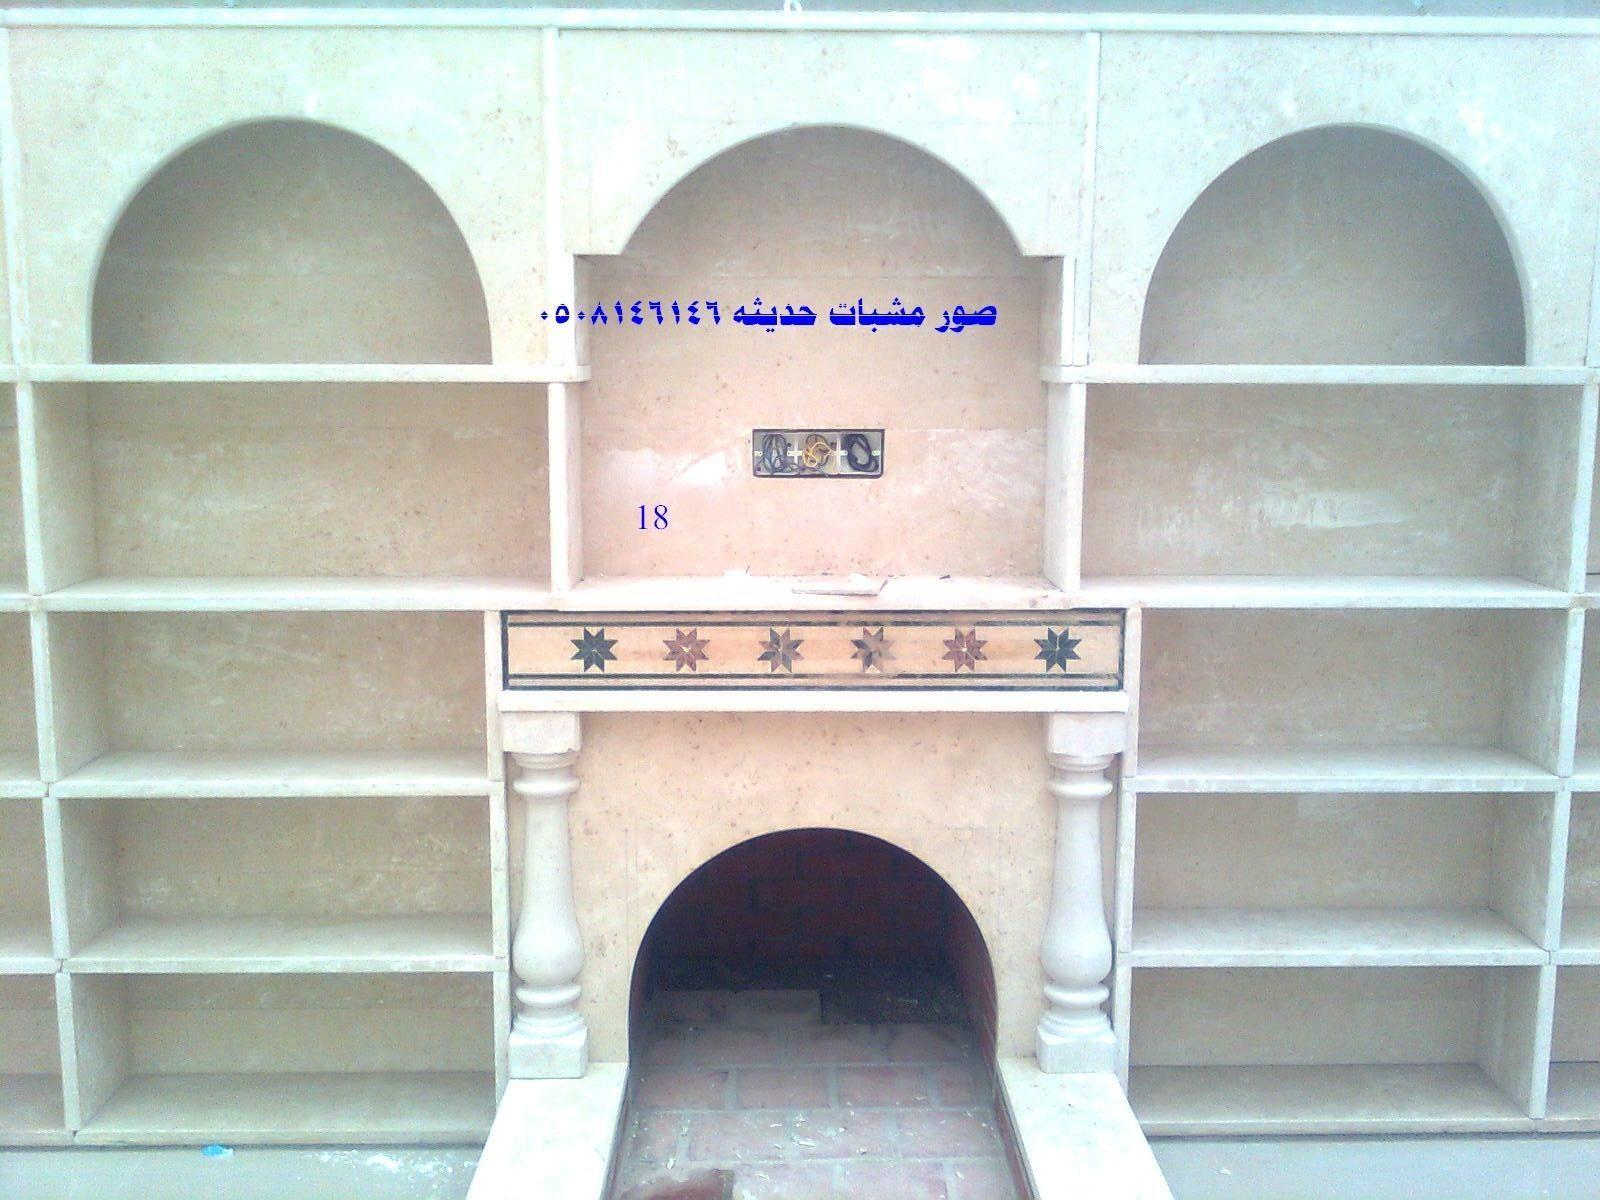 صورمشبات رخام وحجراجمل الصور0508146146 1_1811